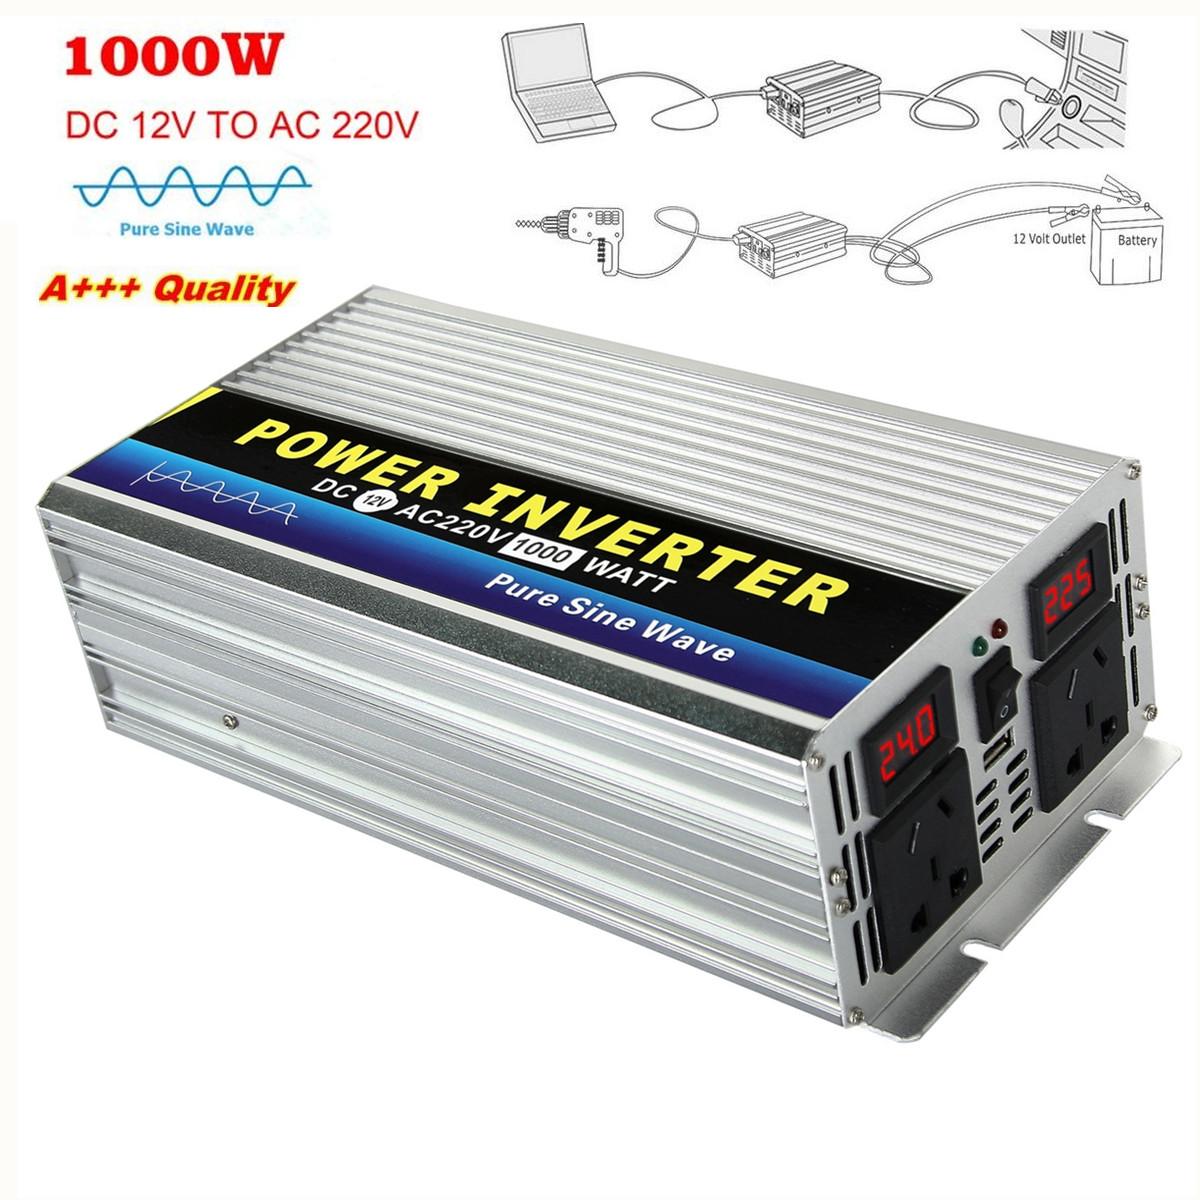 Power Inverter Pure Sine Wave 1000w 2000w Peak Dc12v To Ac